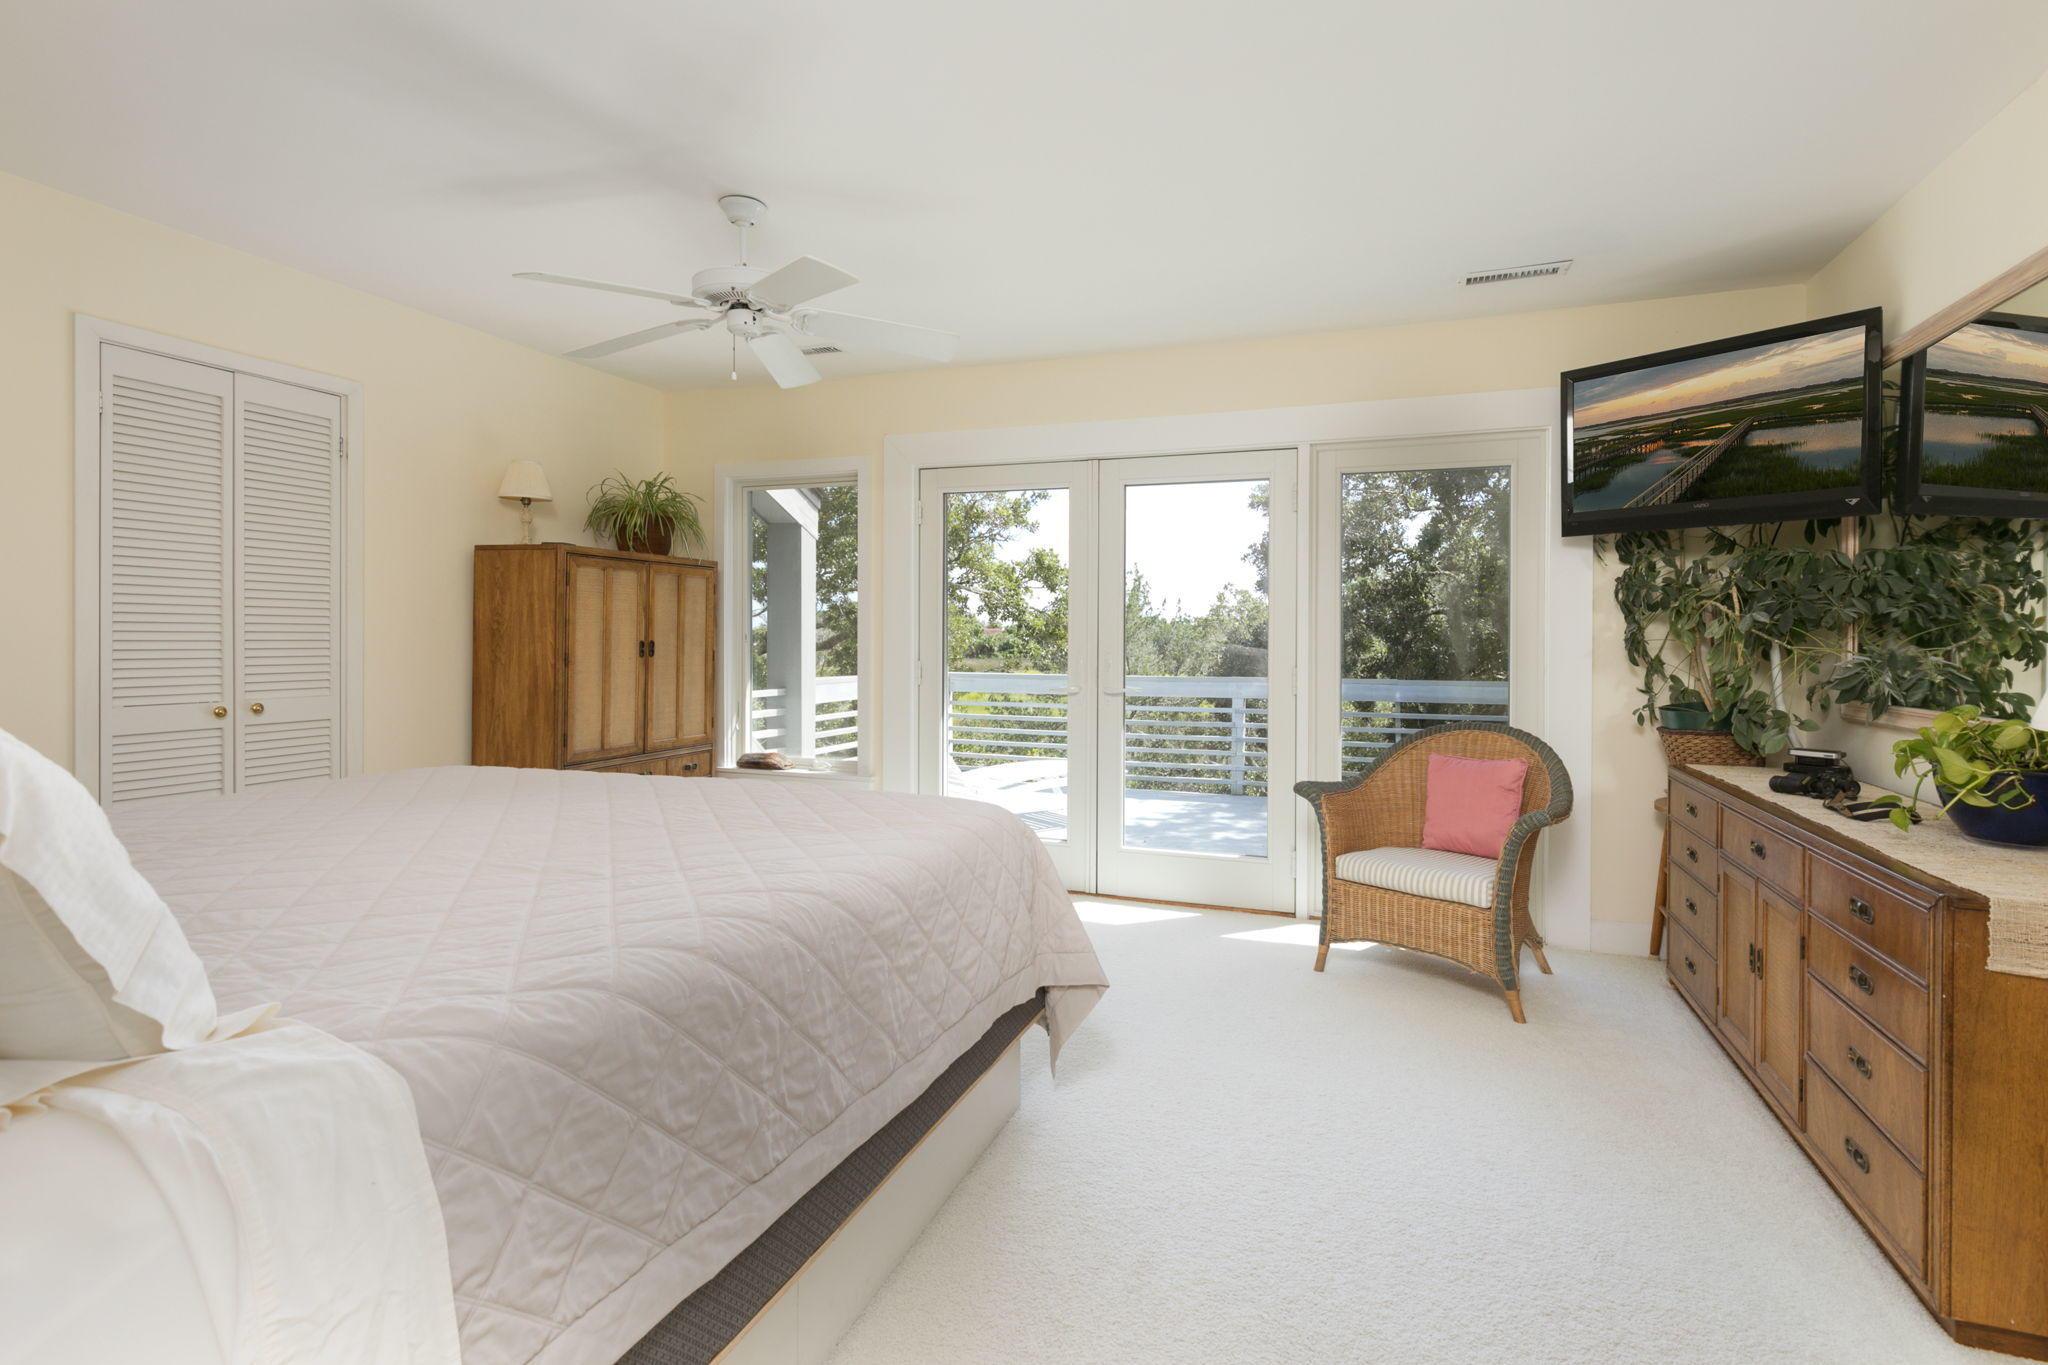 Seabrook Island Homes For Sale - 3360 Seabrook Island, Seabrook Island, SC - 53